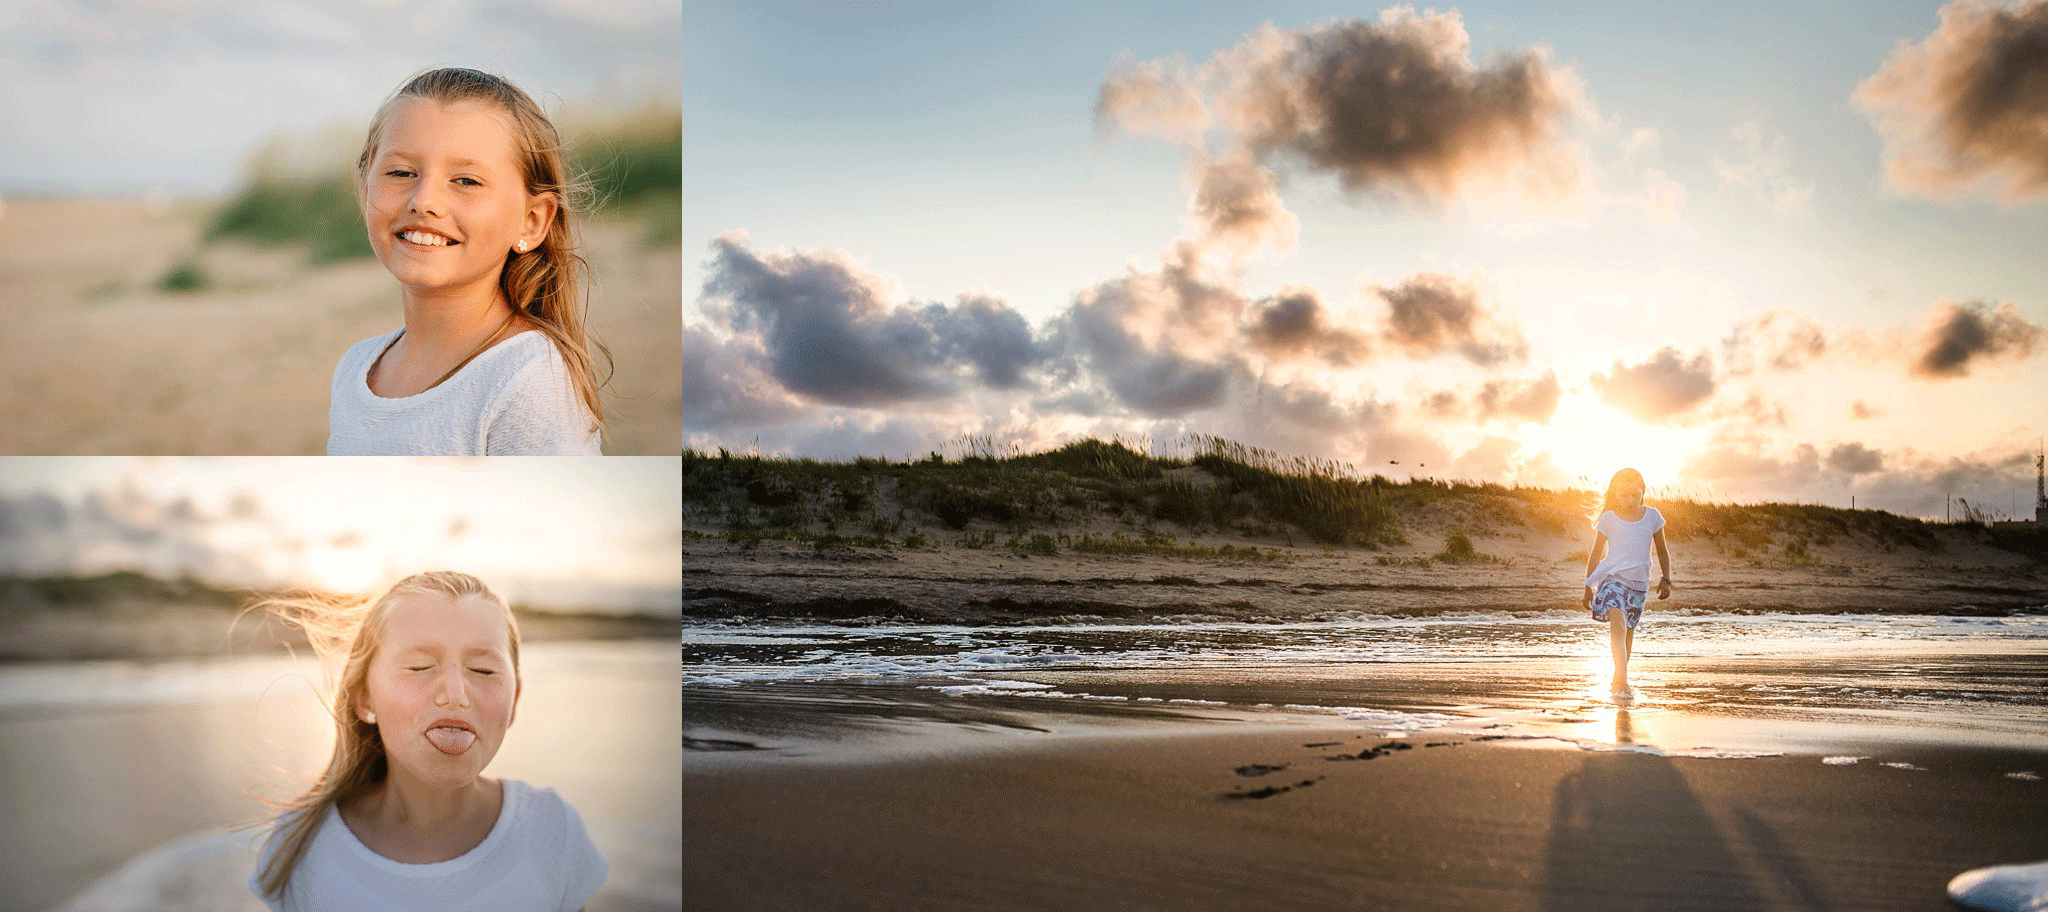 hampton-roads-photographers-sunset-beach-session-virginia-beach-sandbridge-beach-va-melissa-bliss-photography.png